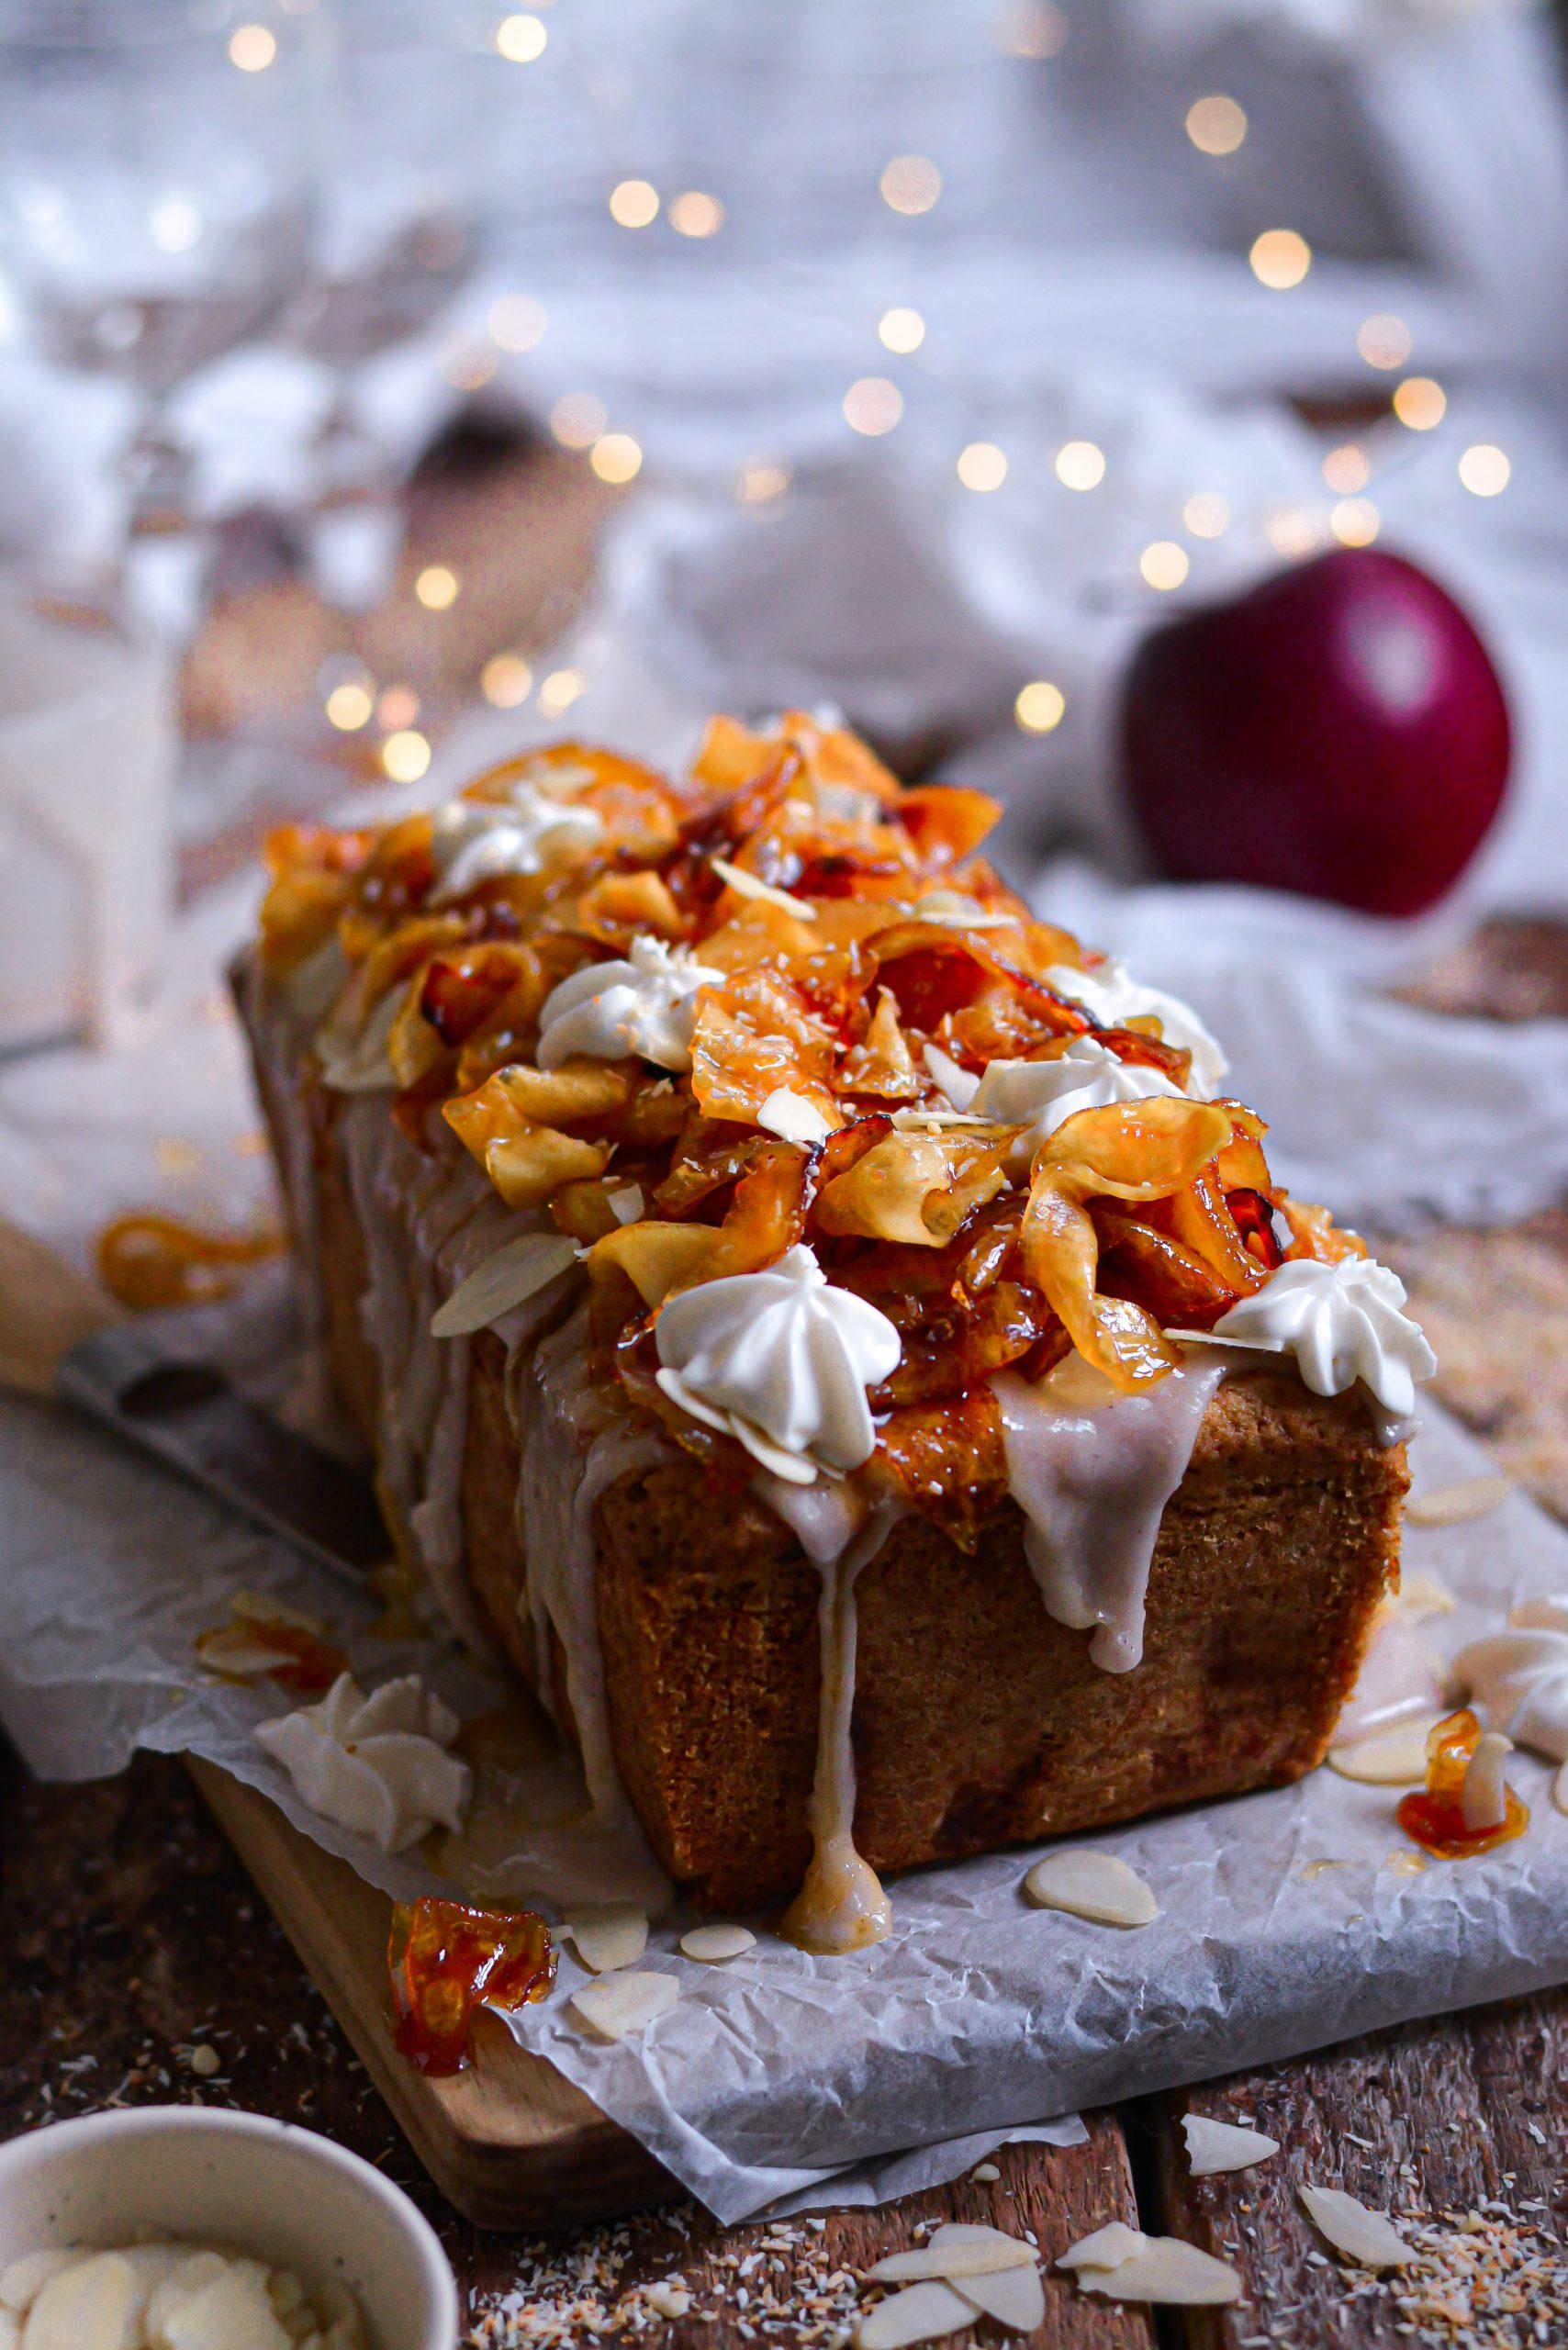 Cake Vegan Facile aux Pommes / Easy Vegan Apple Loaf Cake